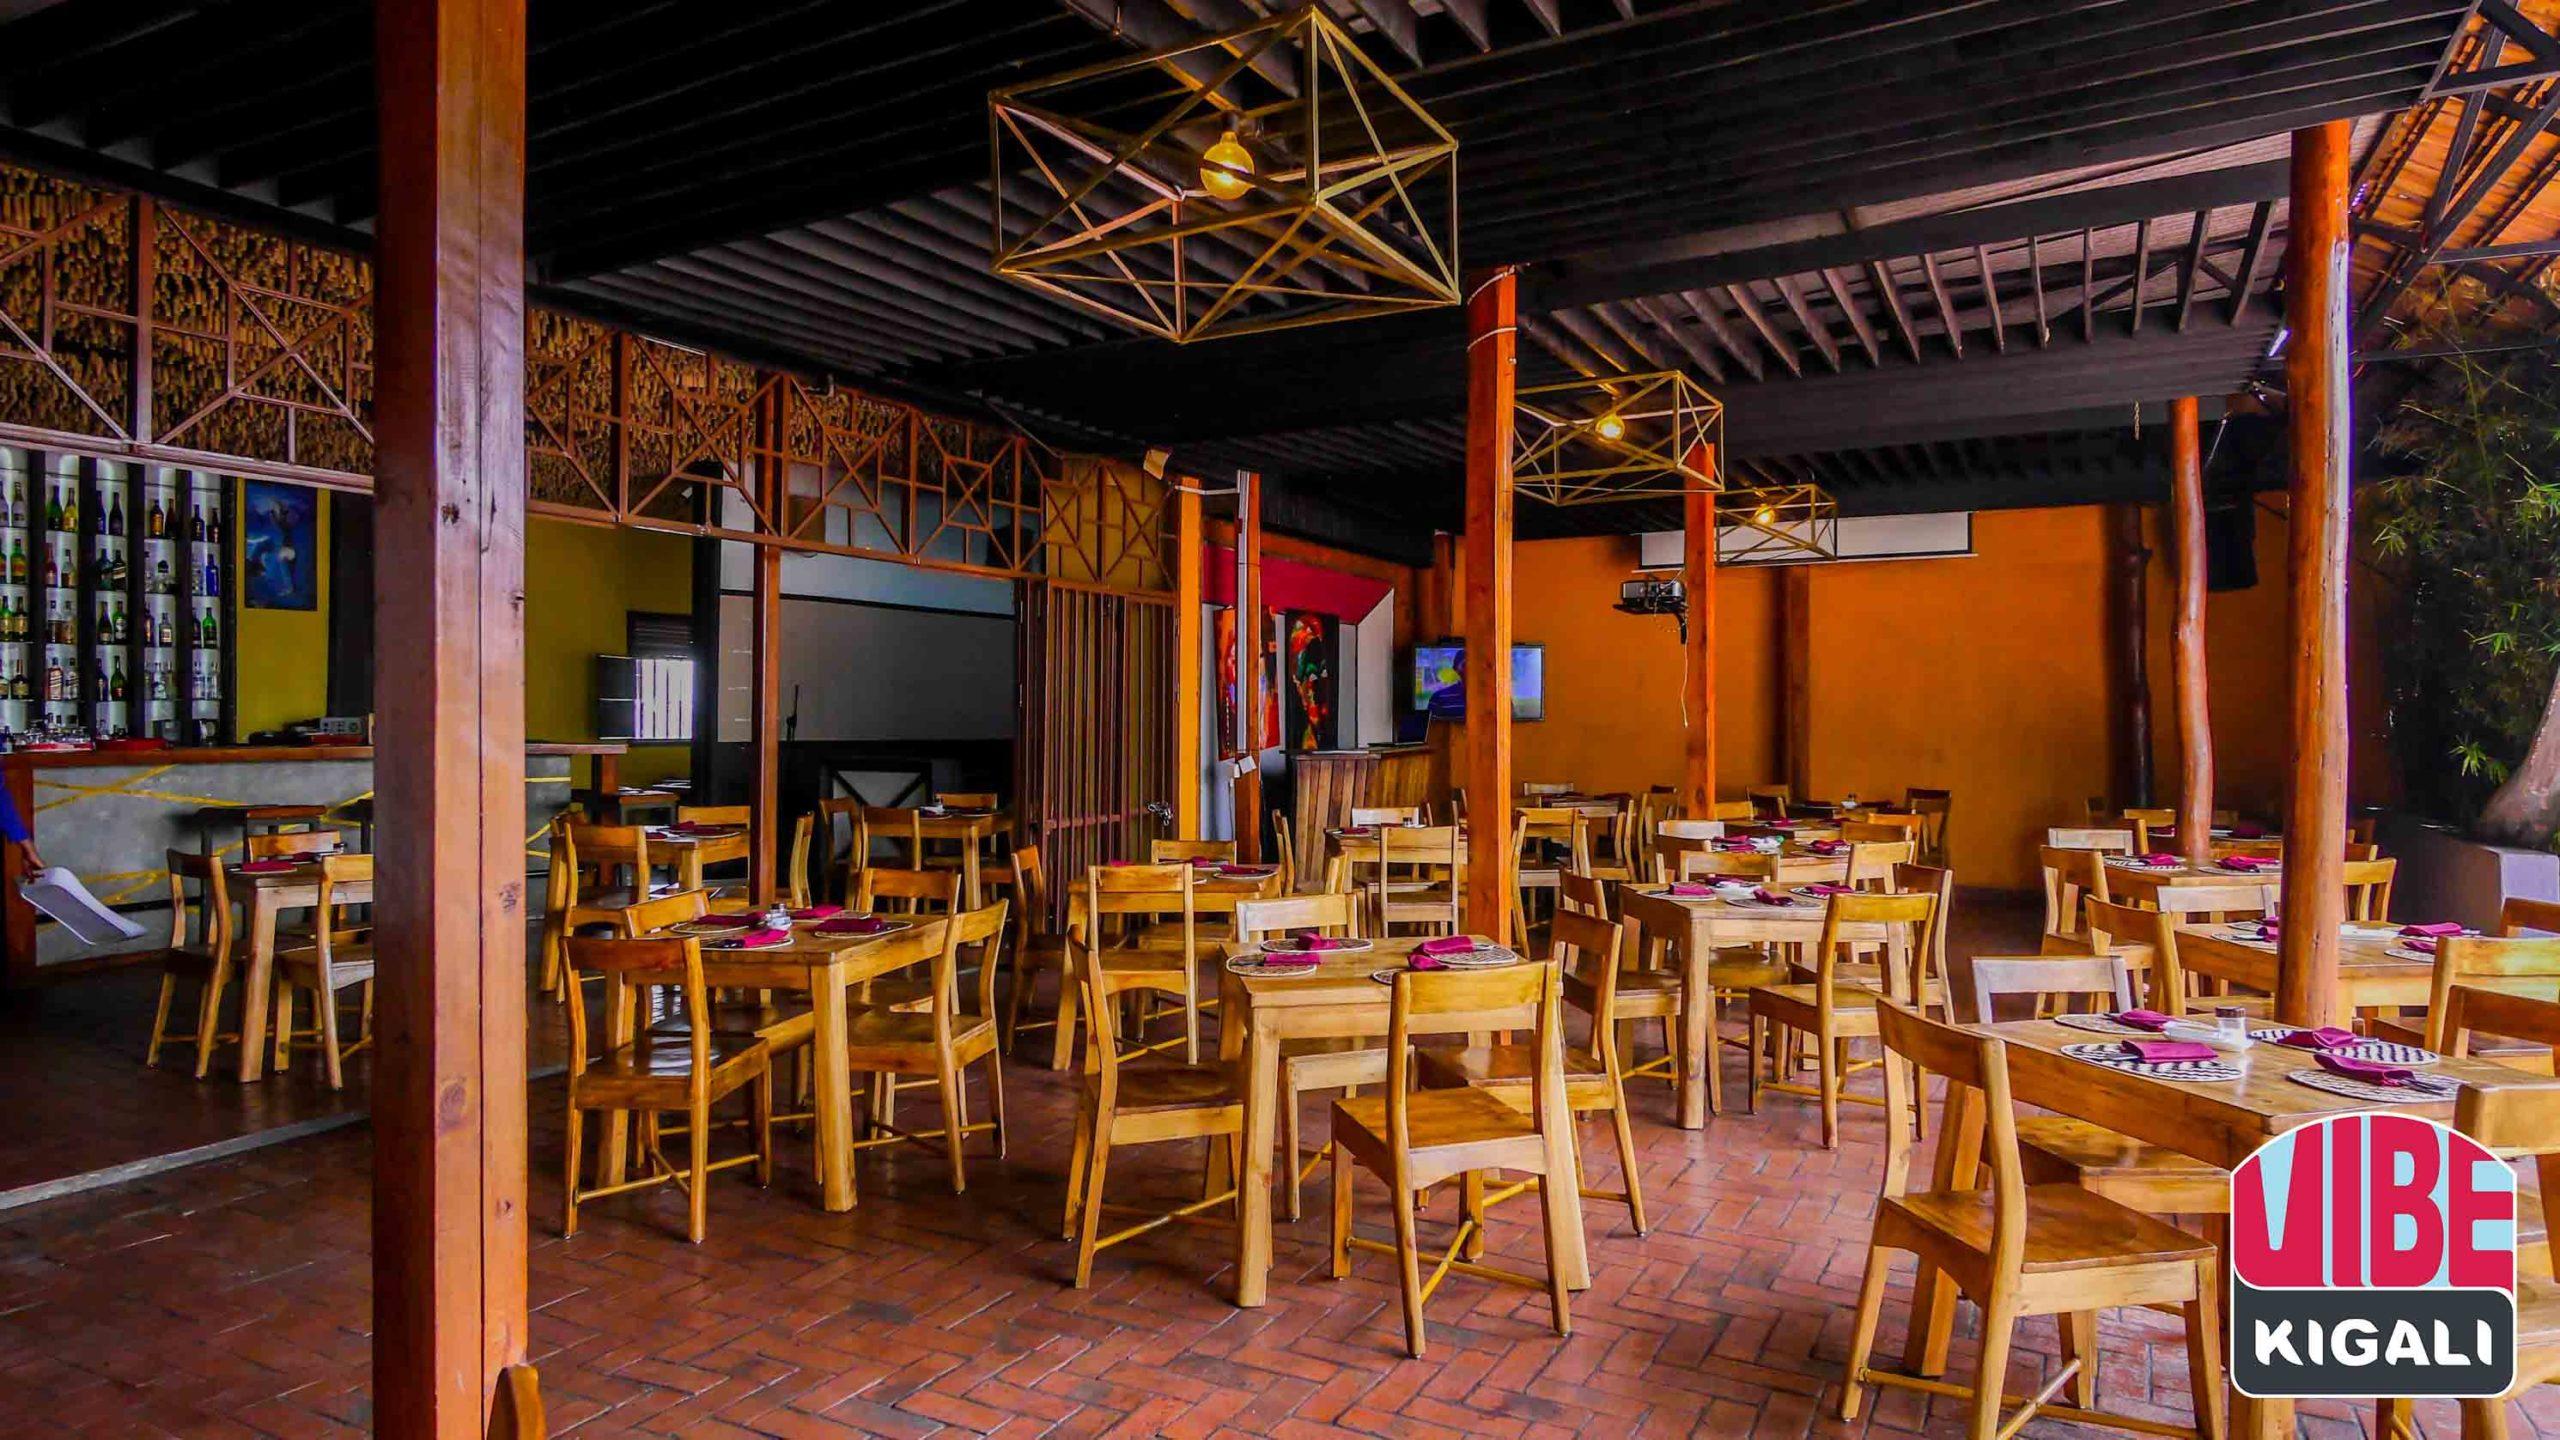 Burrows Bar & Restaurant